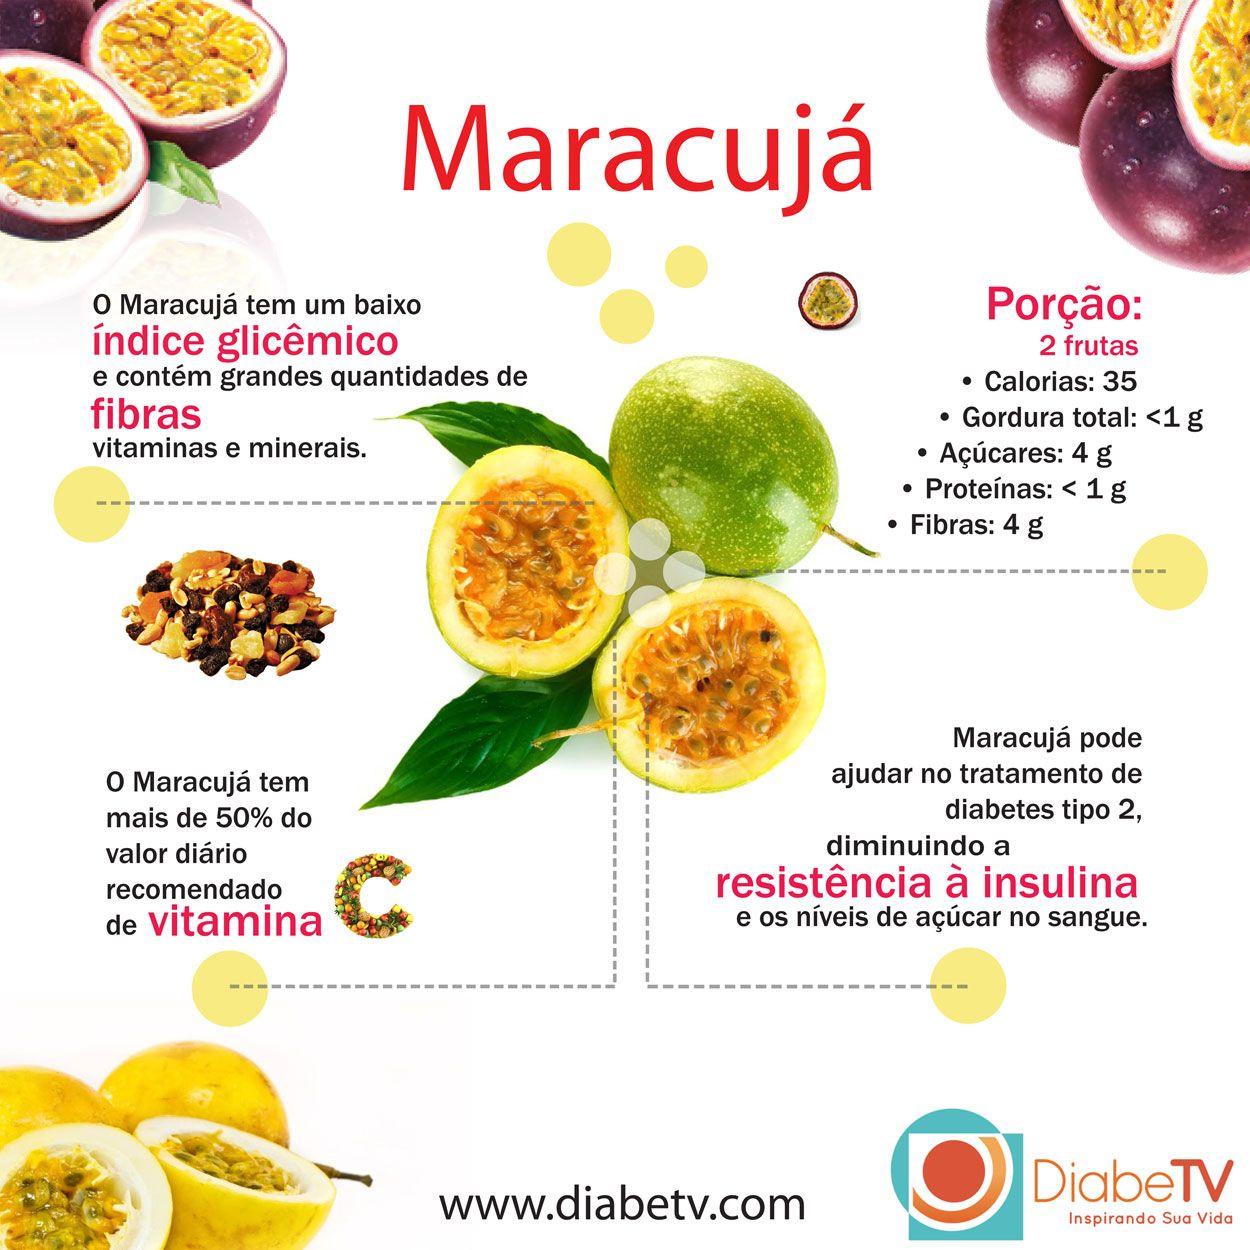 Maracuj fruta permitida para diabeticos vida saud vel pinterest maracuj frutas e sa de - Alimentos diabetes permitidos ...